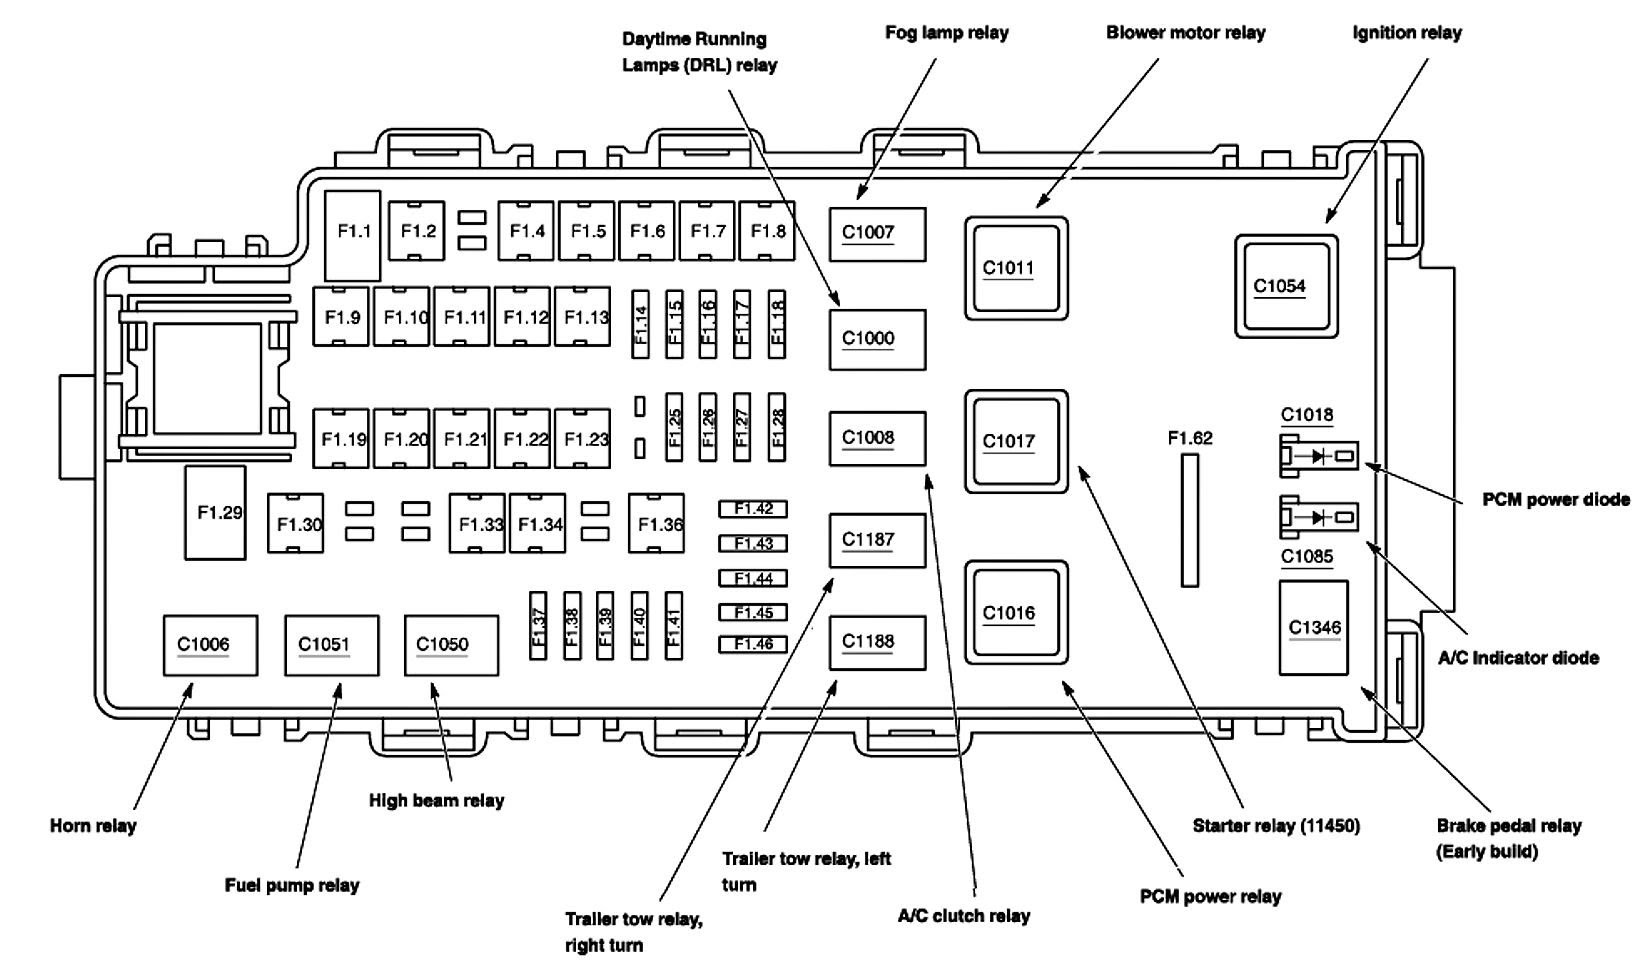 99 Mercury Mountaineer Fuse Diagram 1991 Acura Integra Distributor Wire Diagram Rcba Cable Kankubuktikan Jeanjaures37 Fr